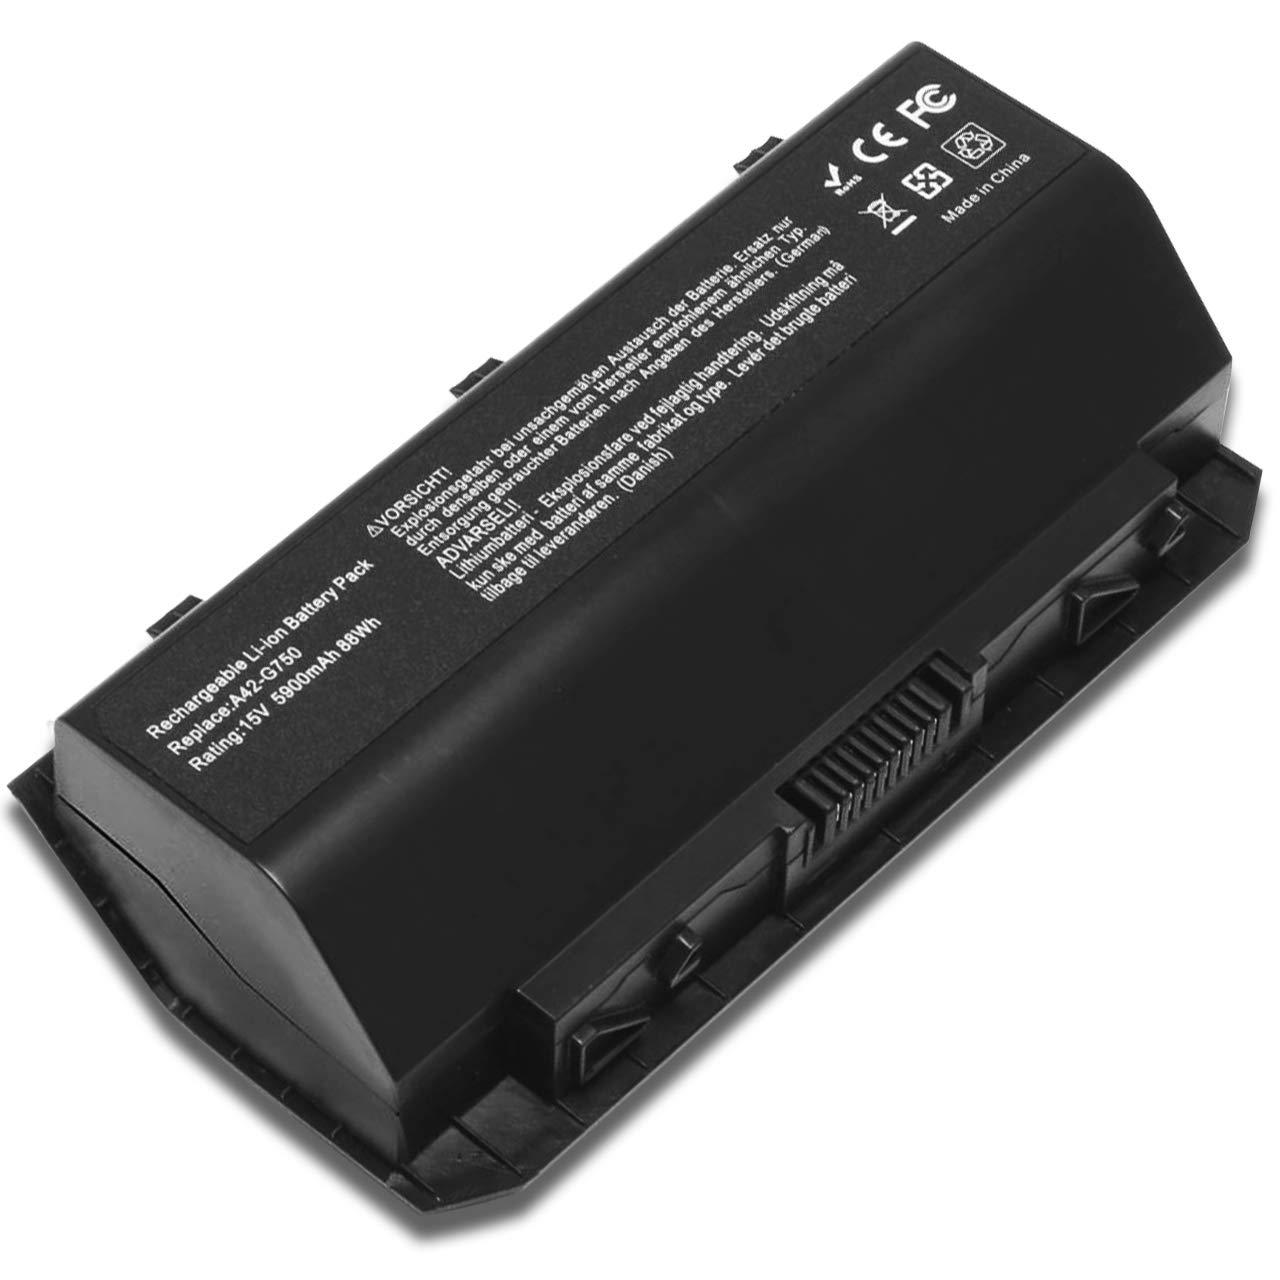 Bateria 88Wh A42-G750 G750 G750J G750JH Asus ROG G750JH G750